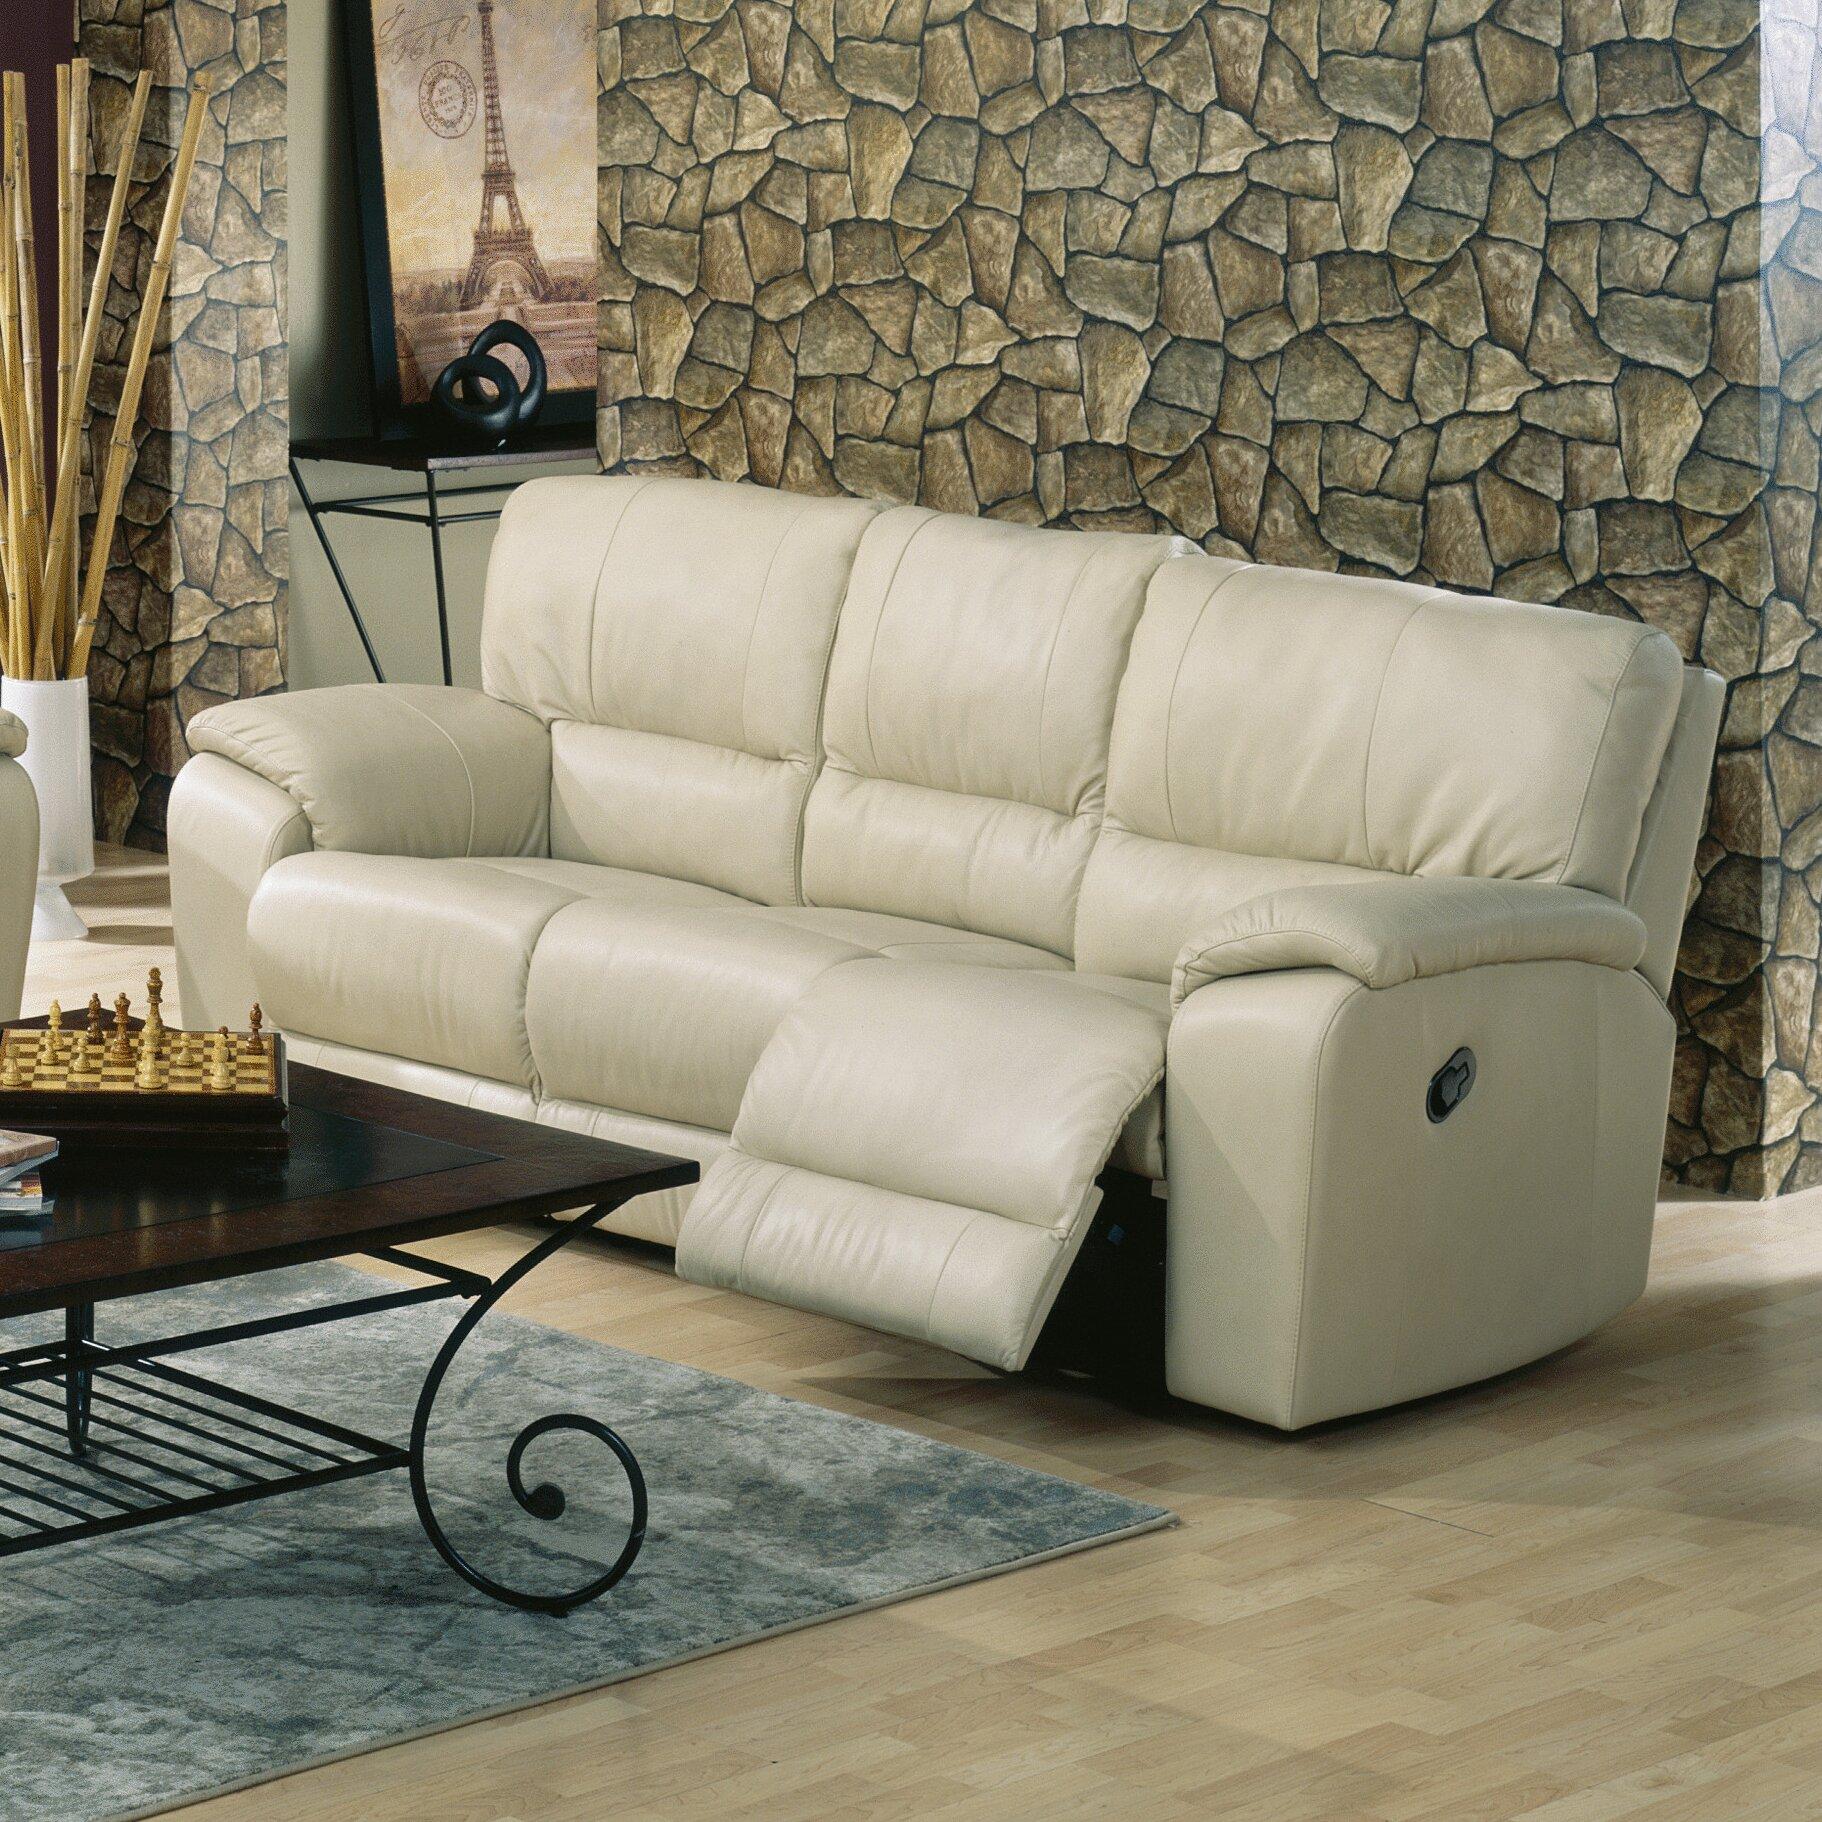 Palliser Leather Reclining Sofa Reviews: Palliser Furniture Shields Reclining Sofa & Reviews